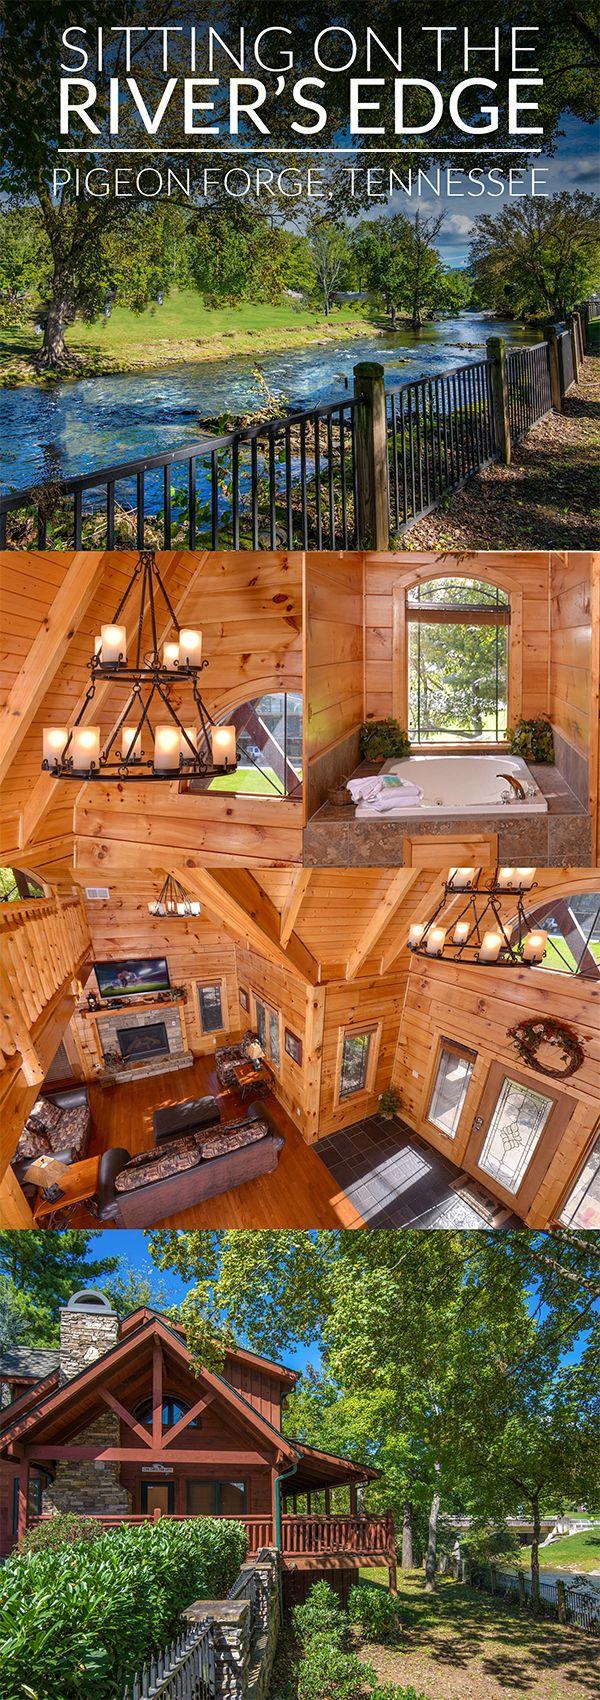 tennessee tn mountain booger sugar cabin in cabins bedroom a gatlinburg